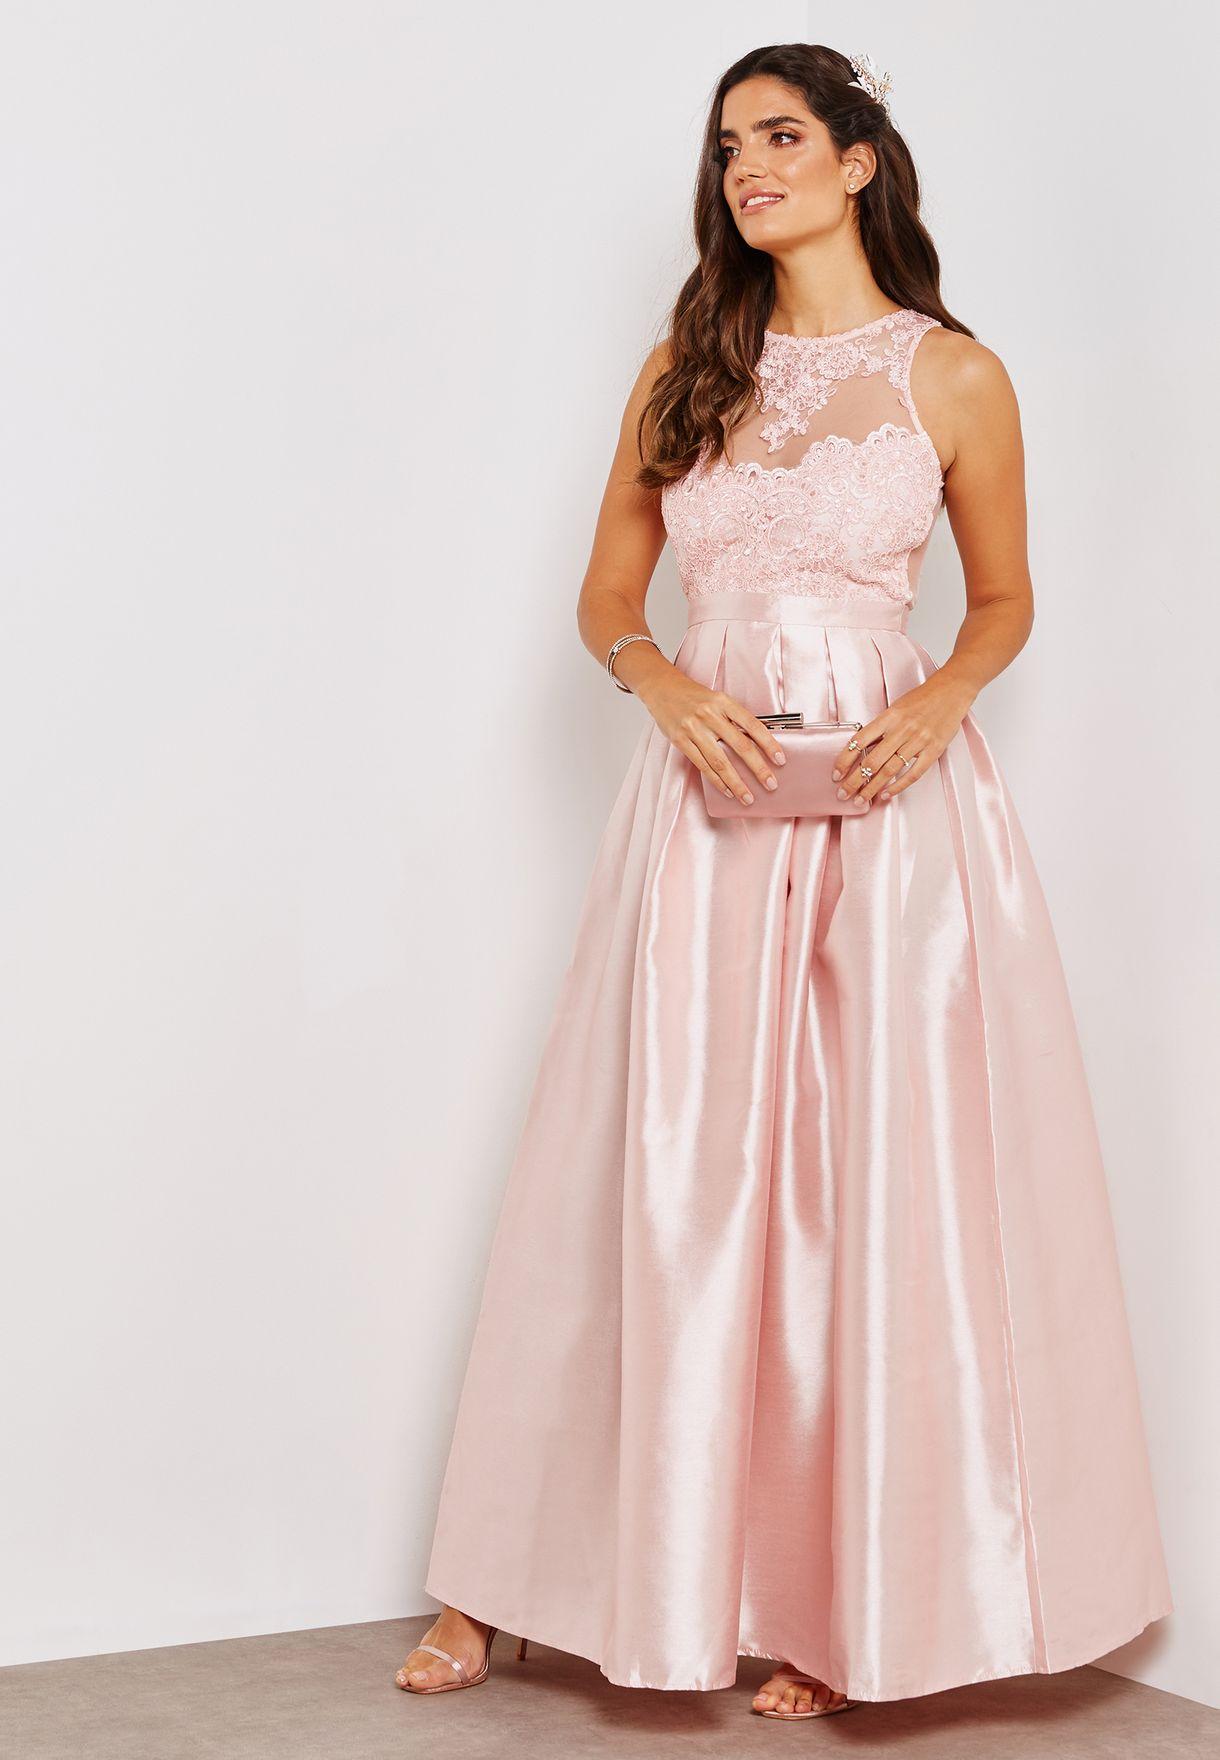 2b374c2ae48 Shop Soieblu pink Lace Illusion Ball Dress M18136 for Women in Saudi ...